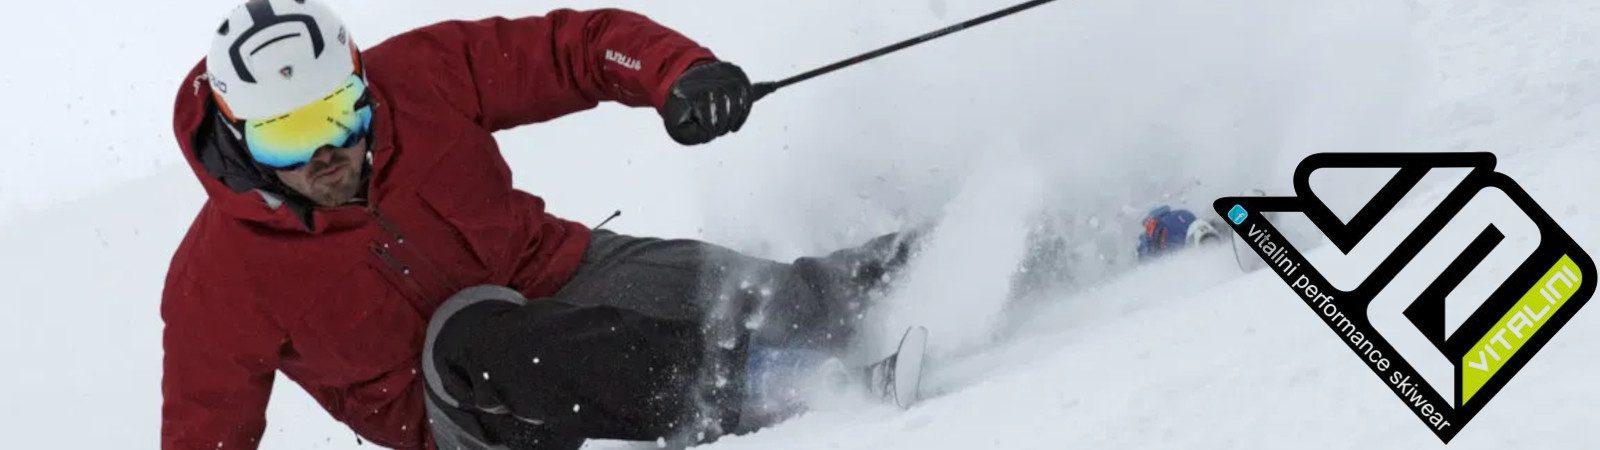 Vitalini Ski Wear